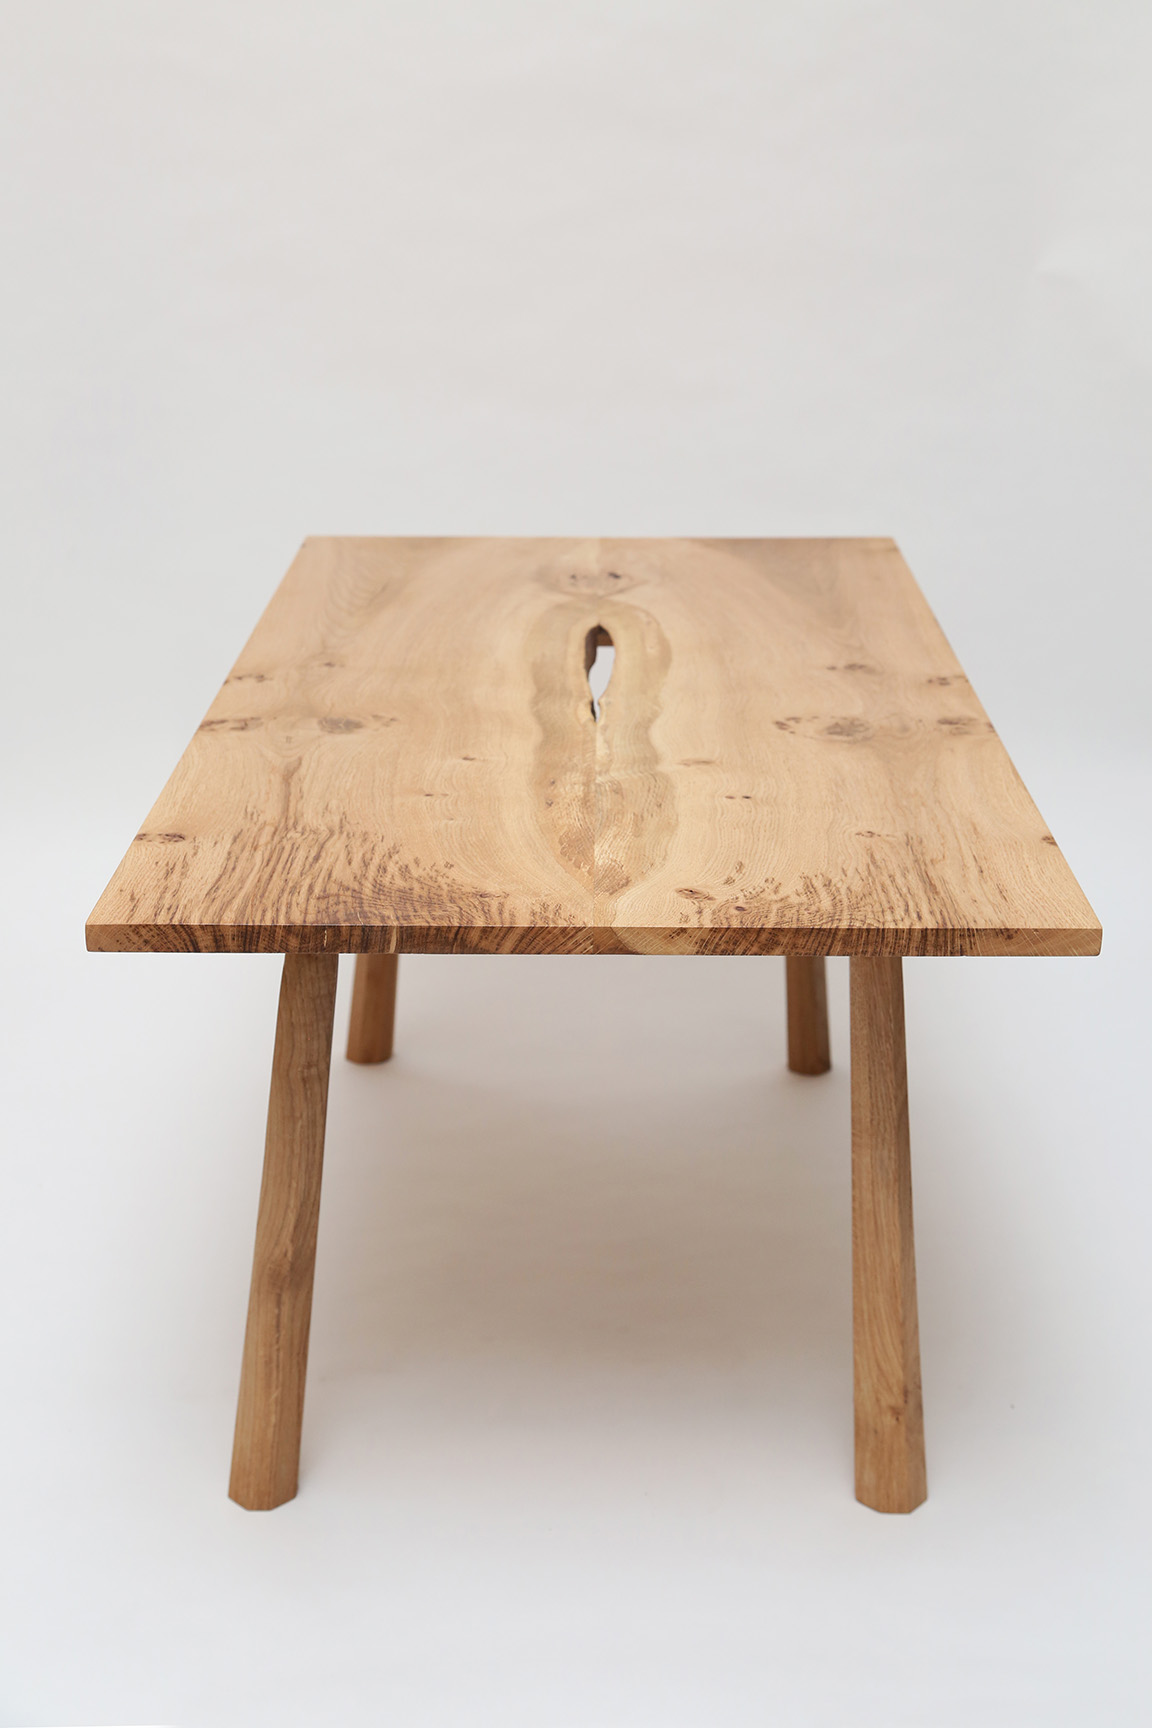 arbor furniture, coffee table, bristol, english oak, oak, bookmatch, bookmatched table, oak table, oak furniture, furniture maker, bristol, bath, somerset furniture